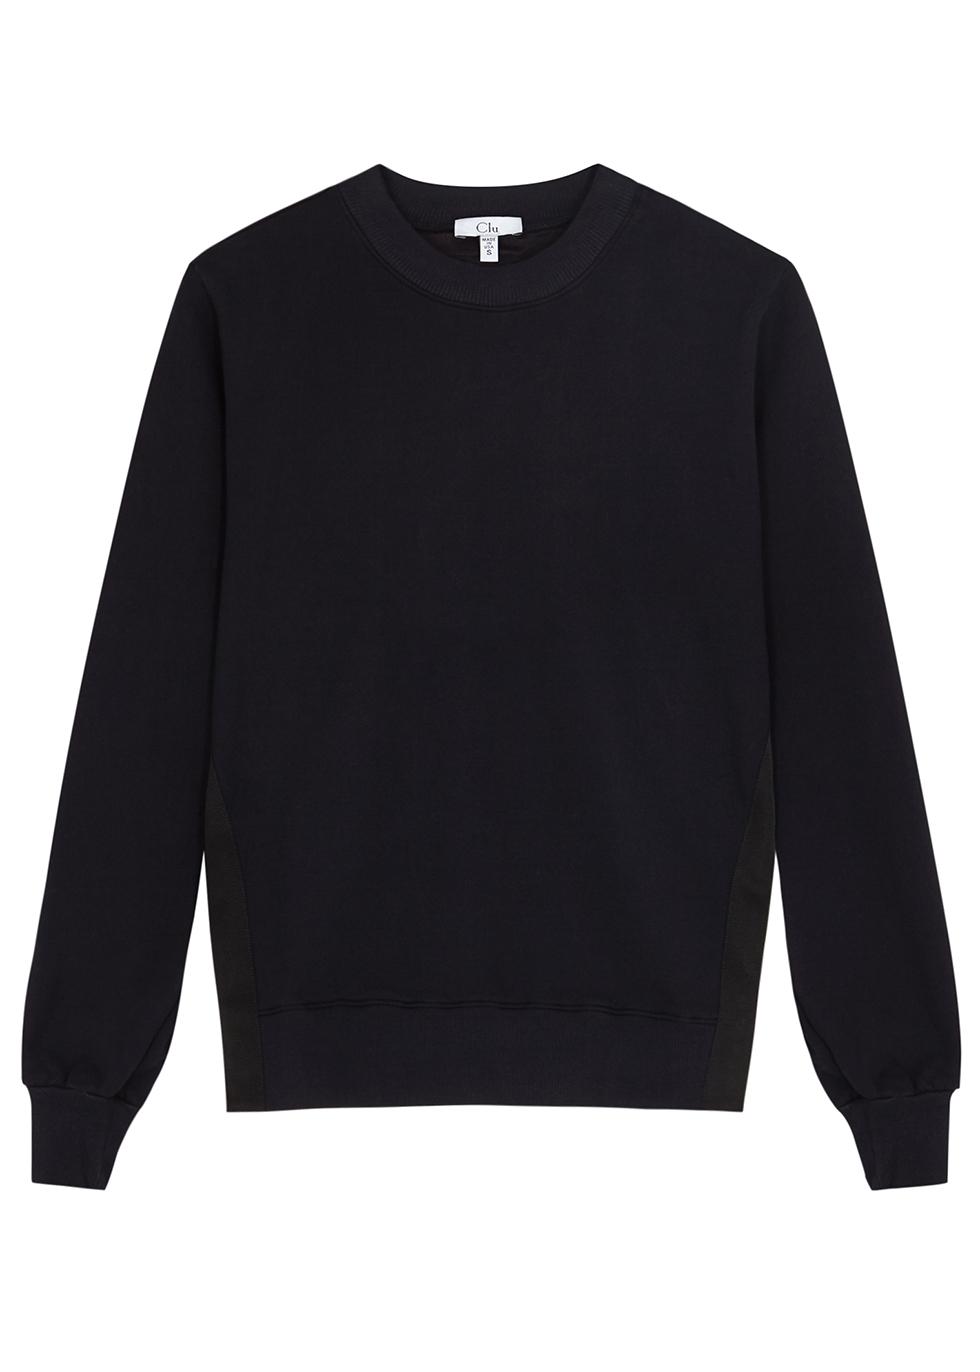 Navy and white cotton sweatshirt - Clu